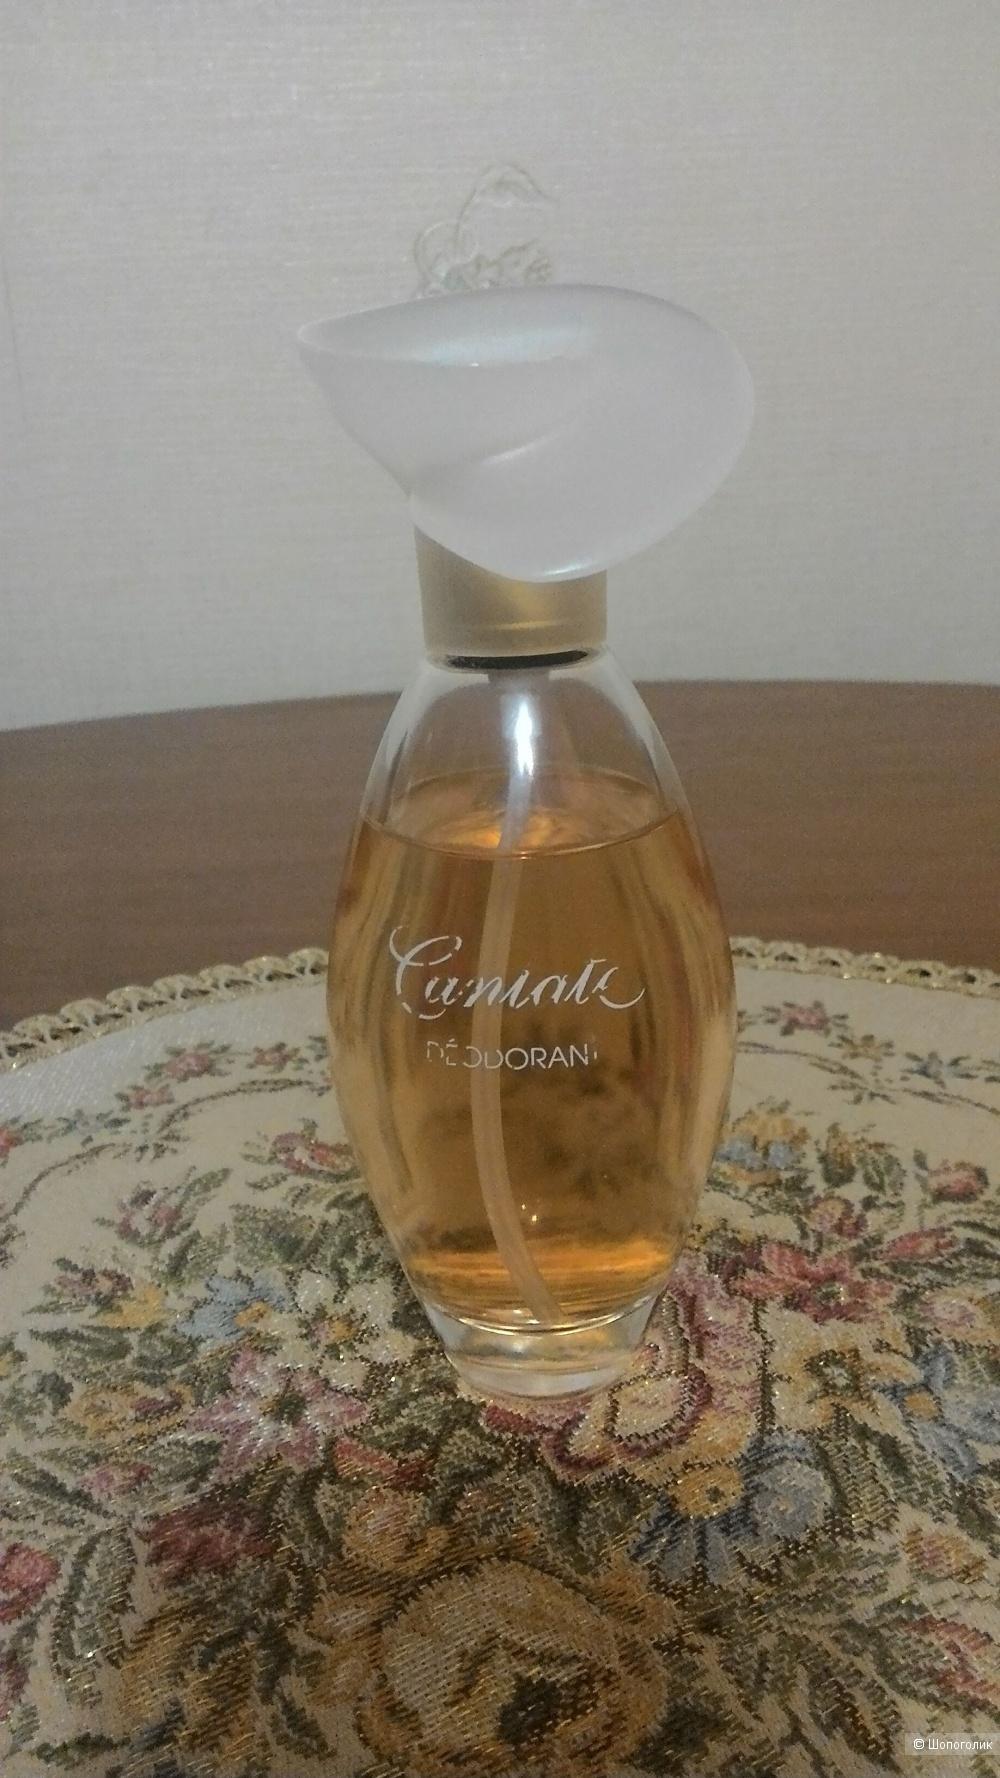 "Yves rocher "" CANTATE"" 75 ml. (реально 65 ml.), deodorant parfume ."